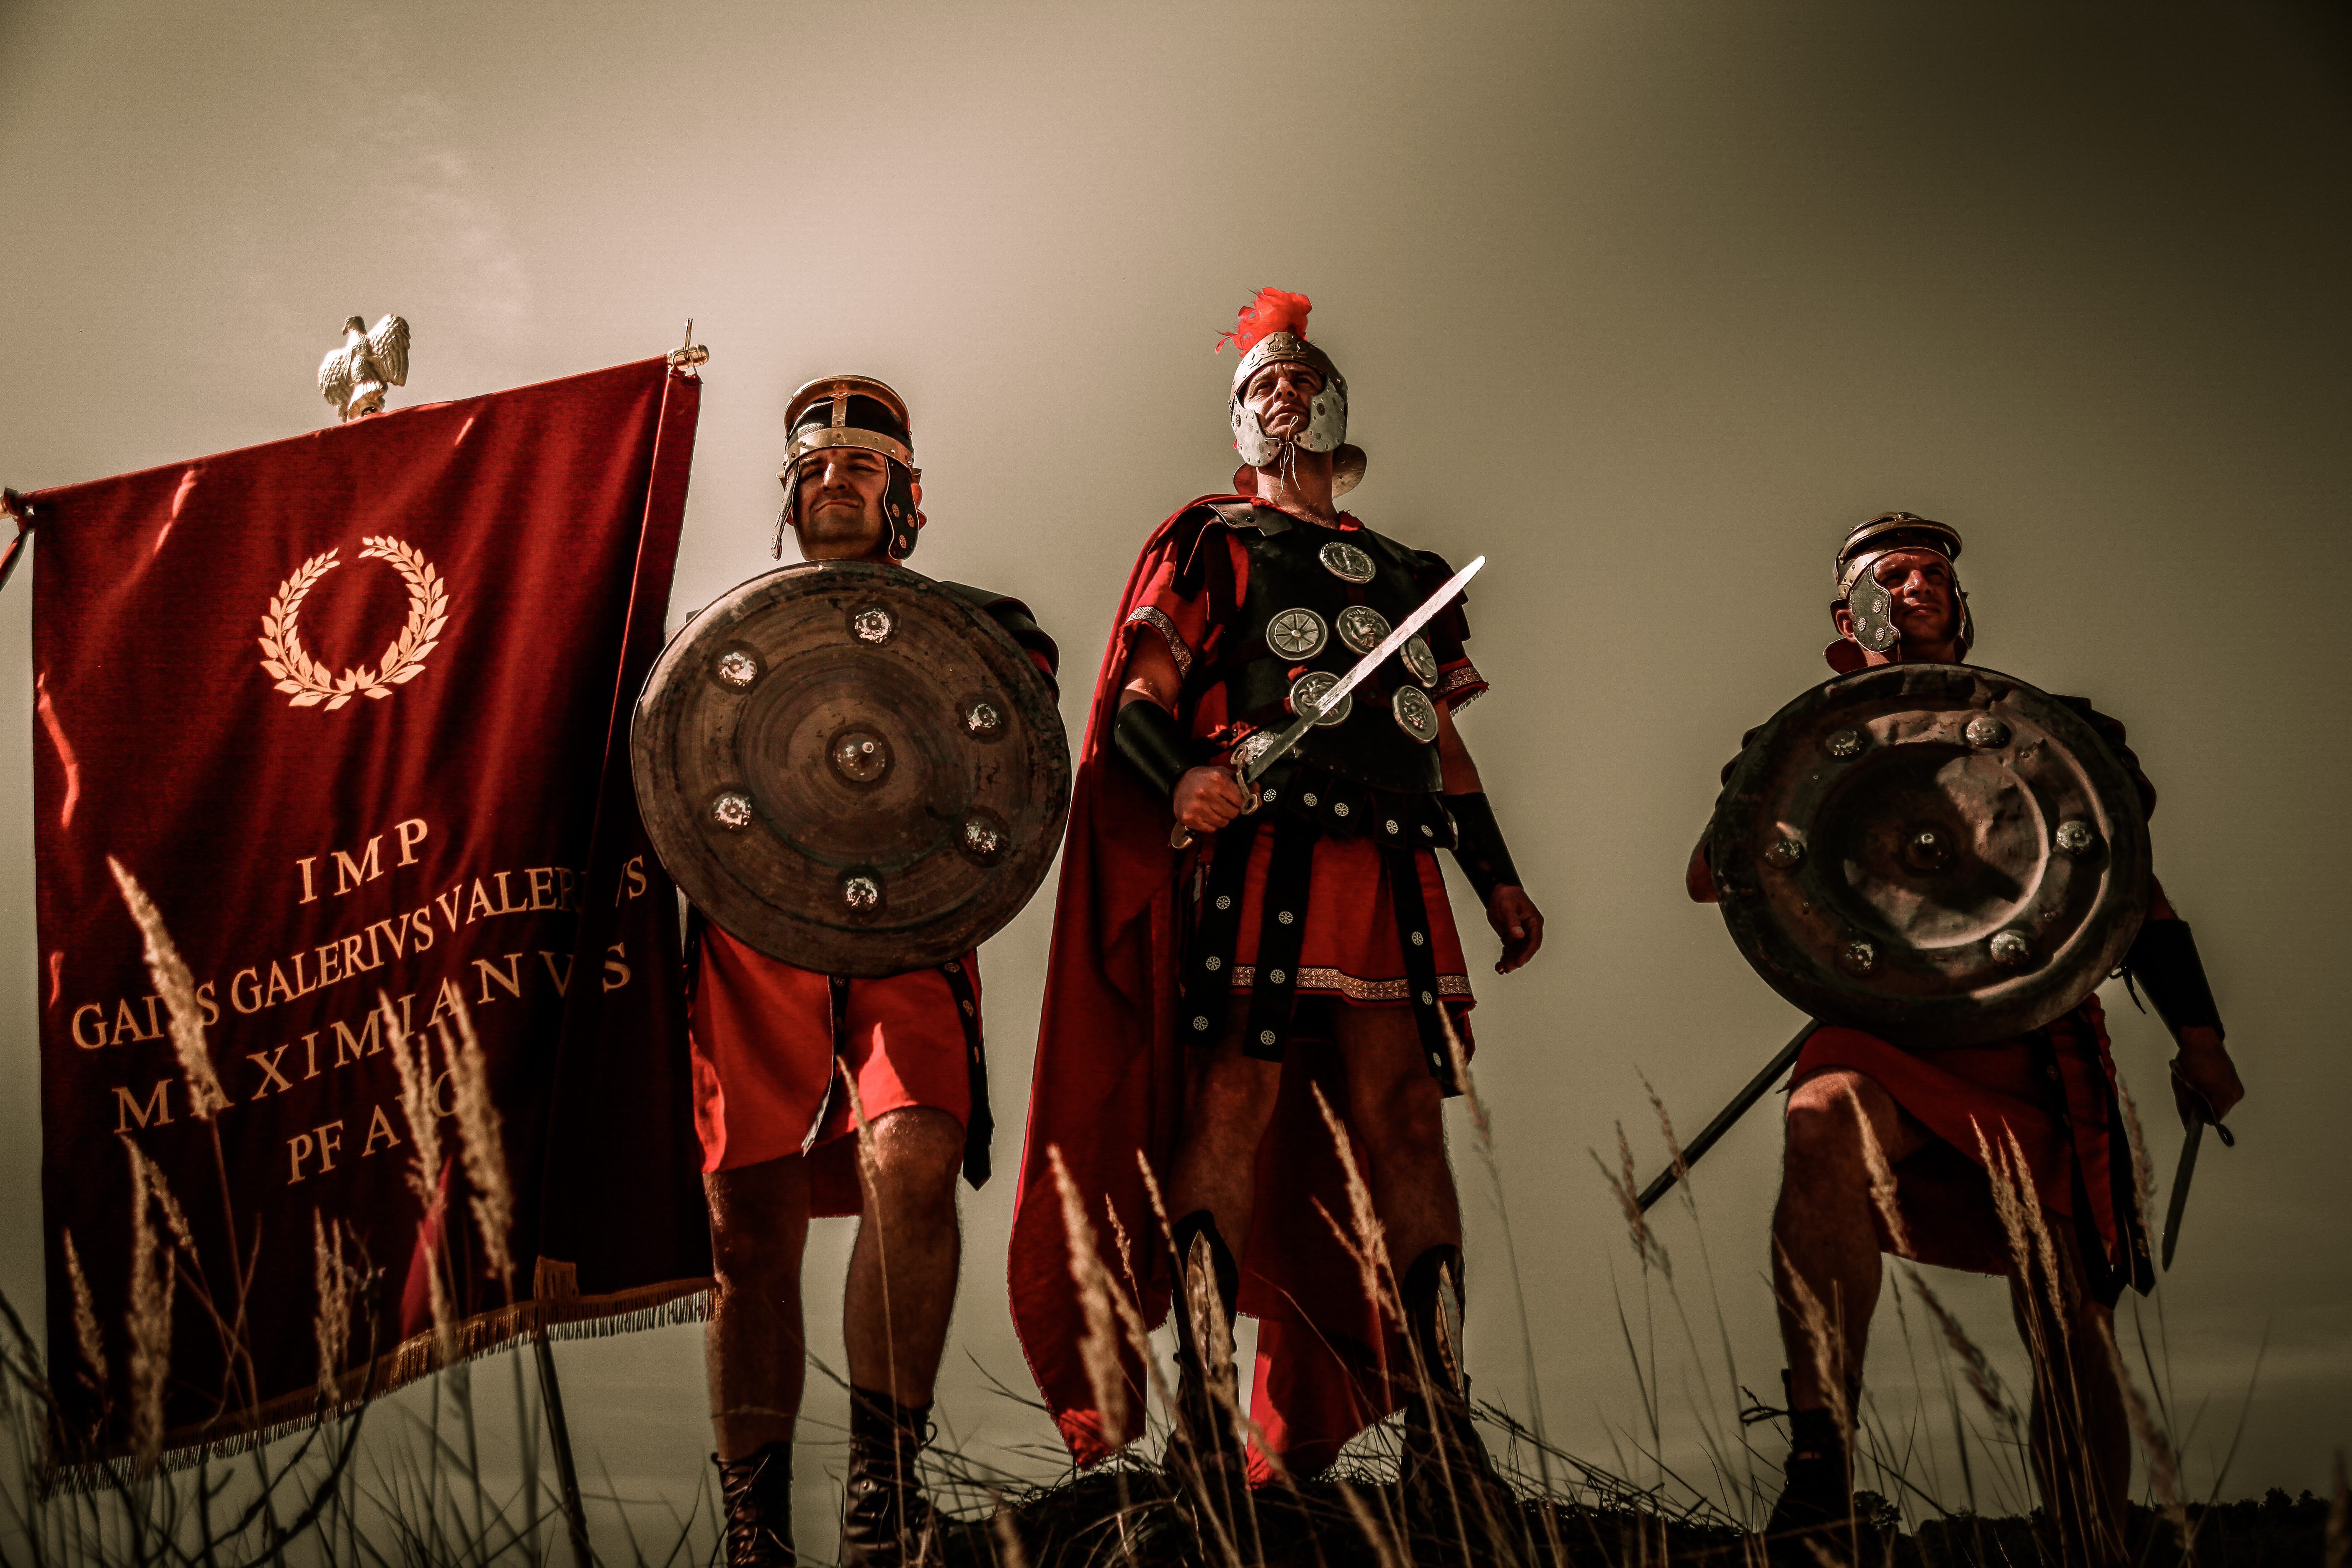 Image Armor Shield Swords Soldiers Warrior Rome Roman 5616x3744